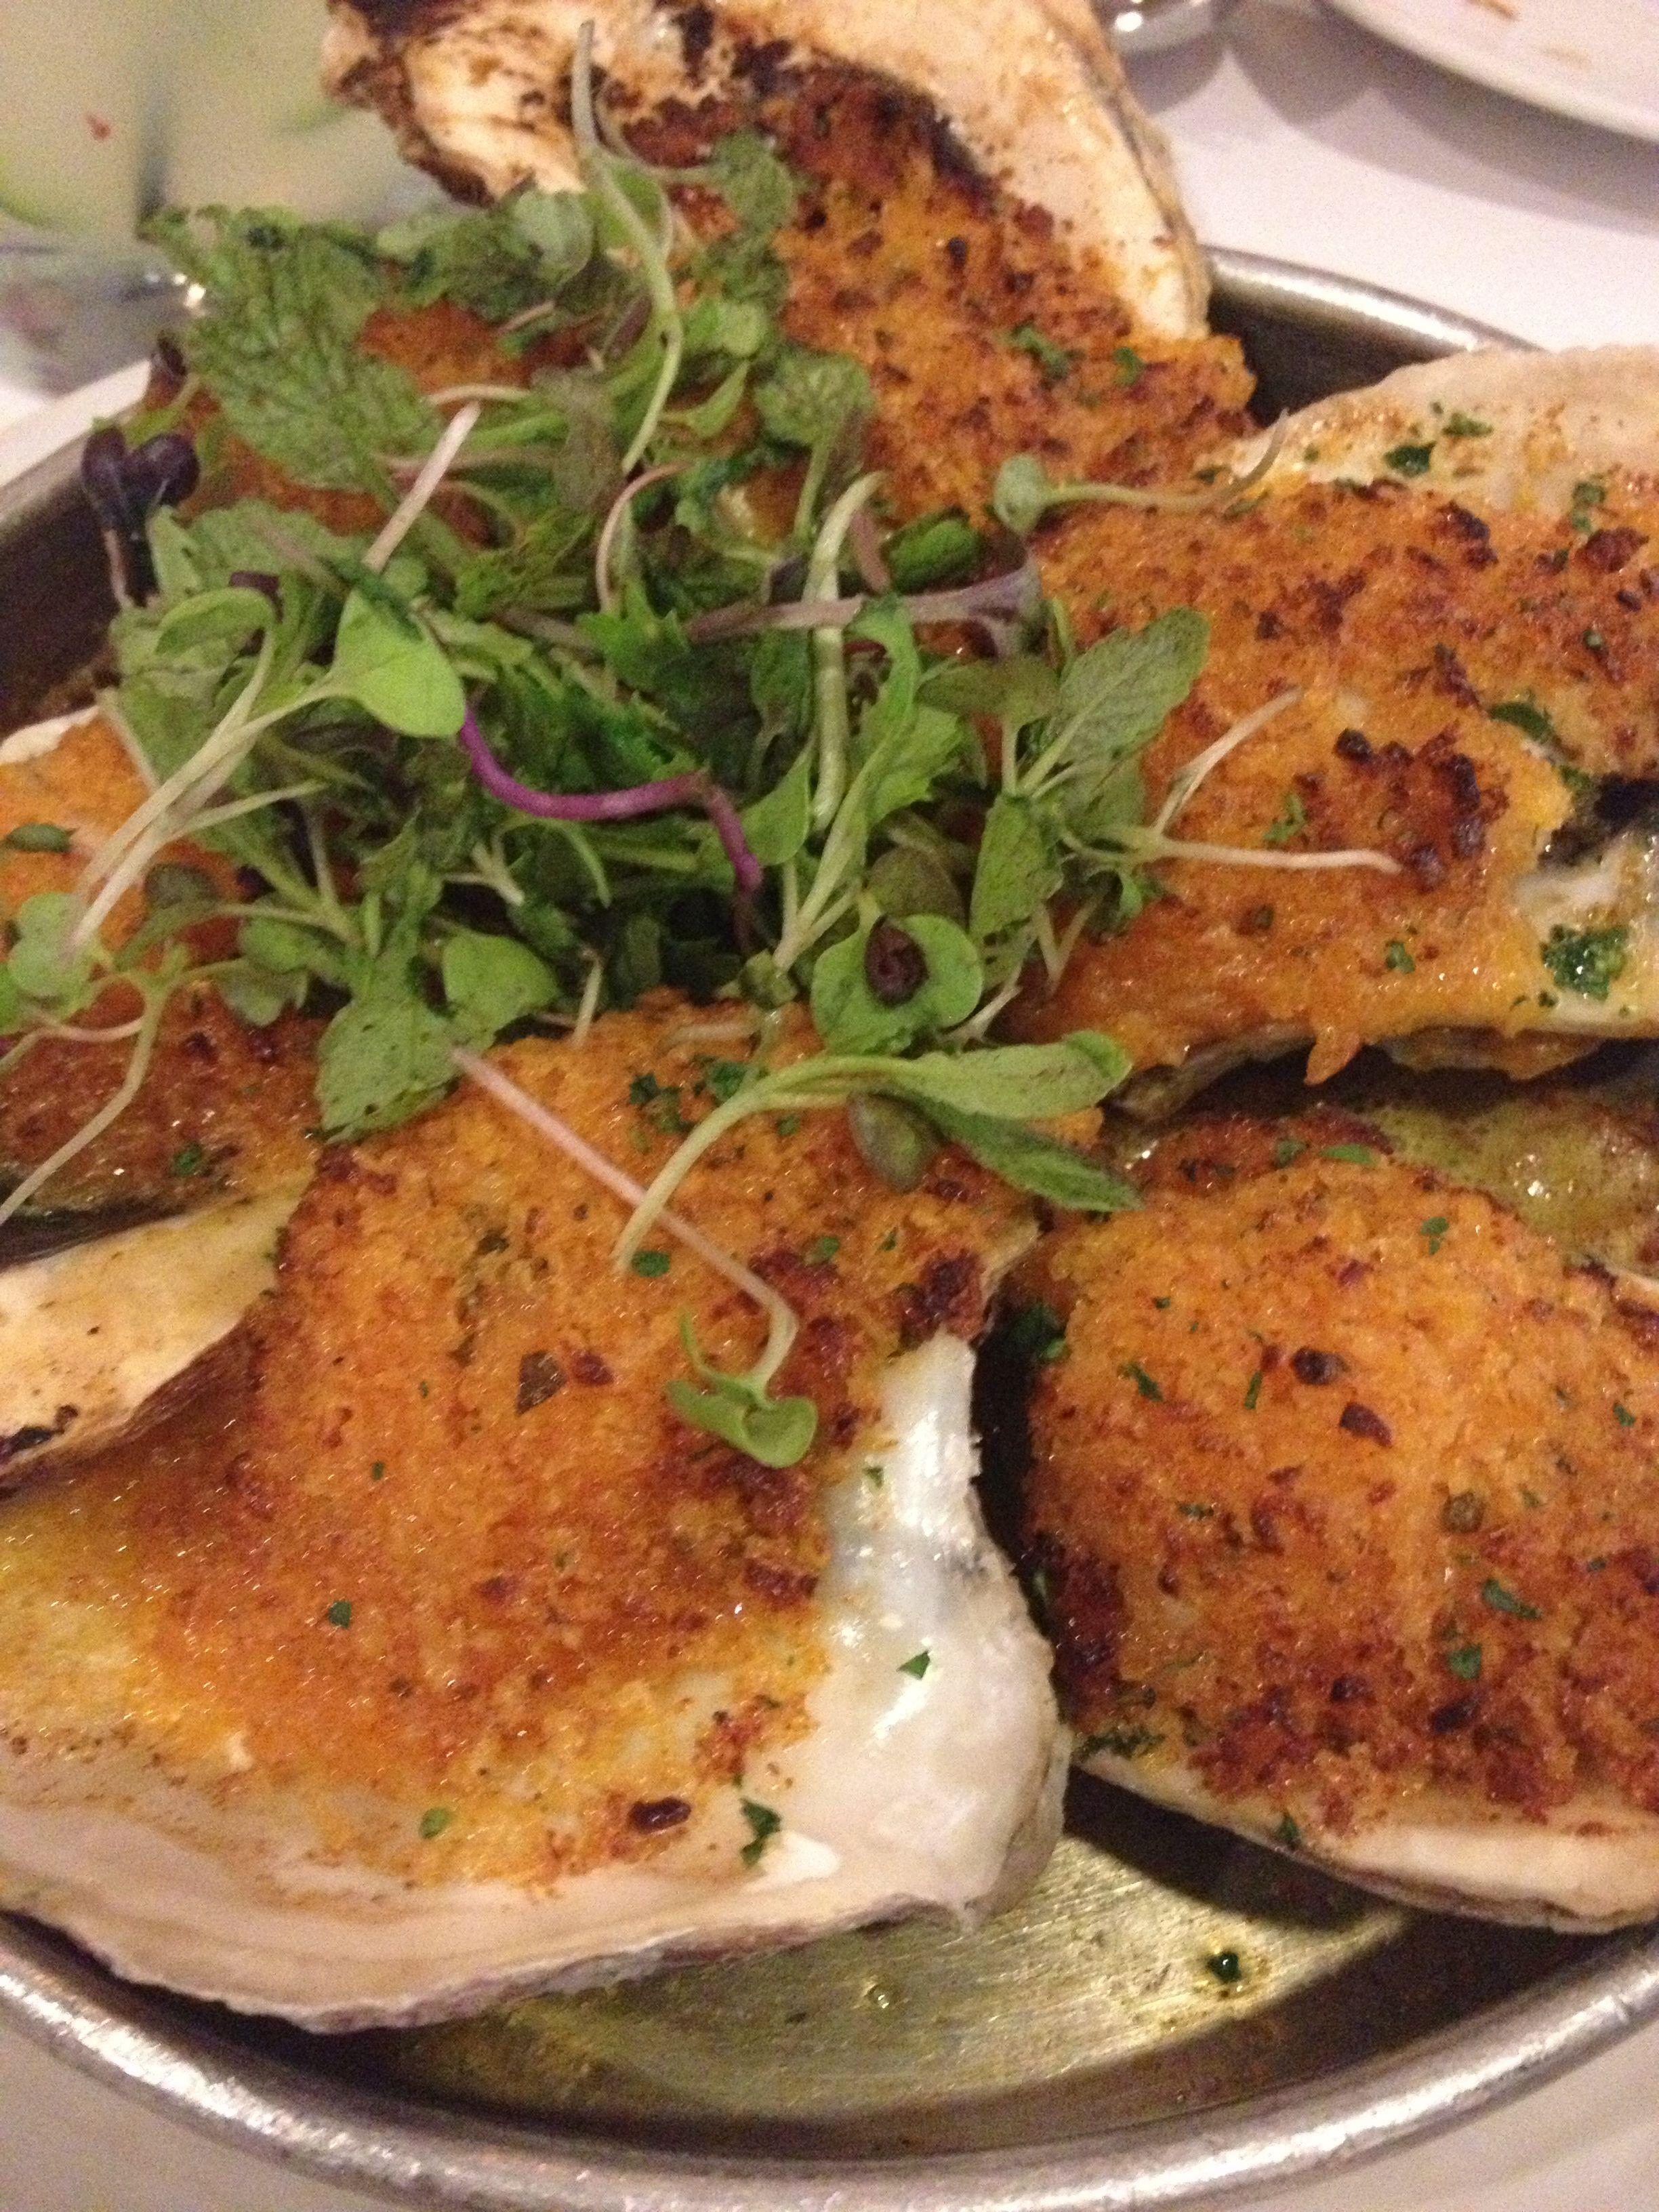 Garlicky baked oysters chef john besh pork belly